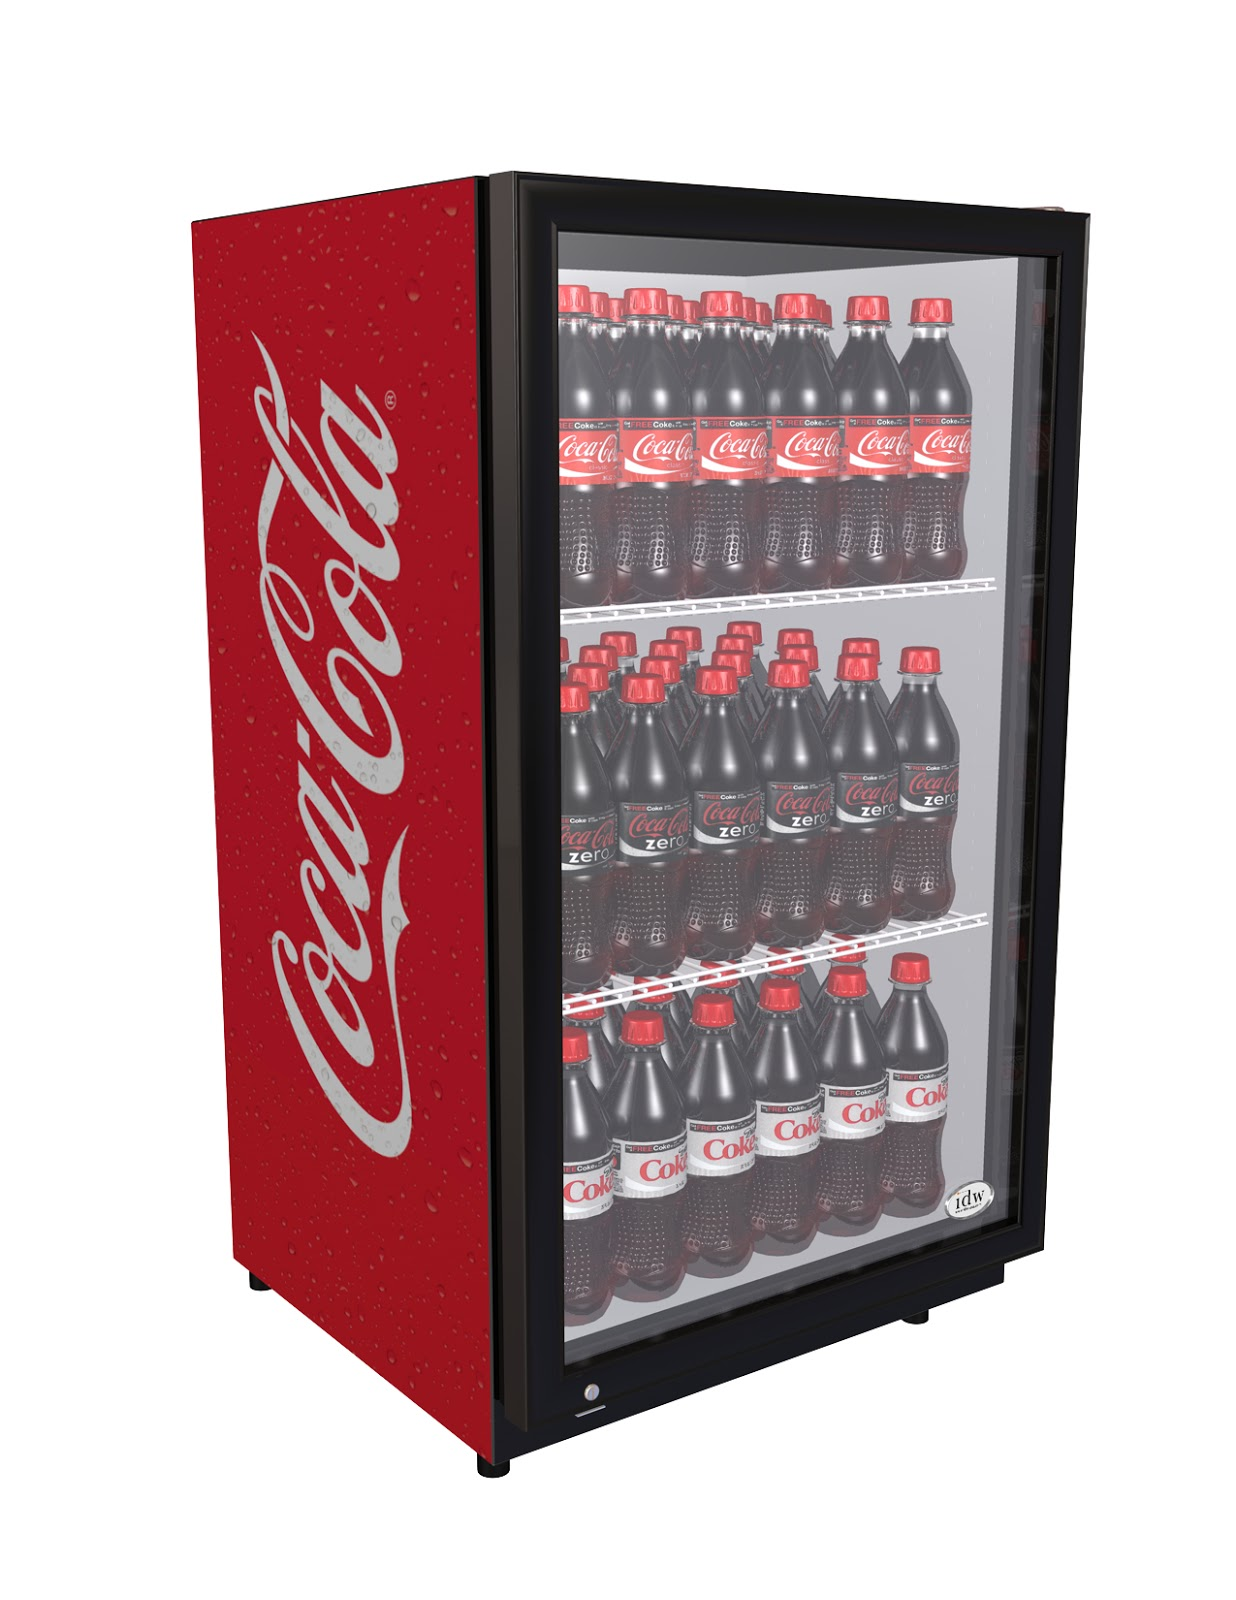 IDW G-series Counter top bottle cooler / Can Cooler | IDW G